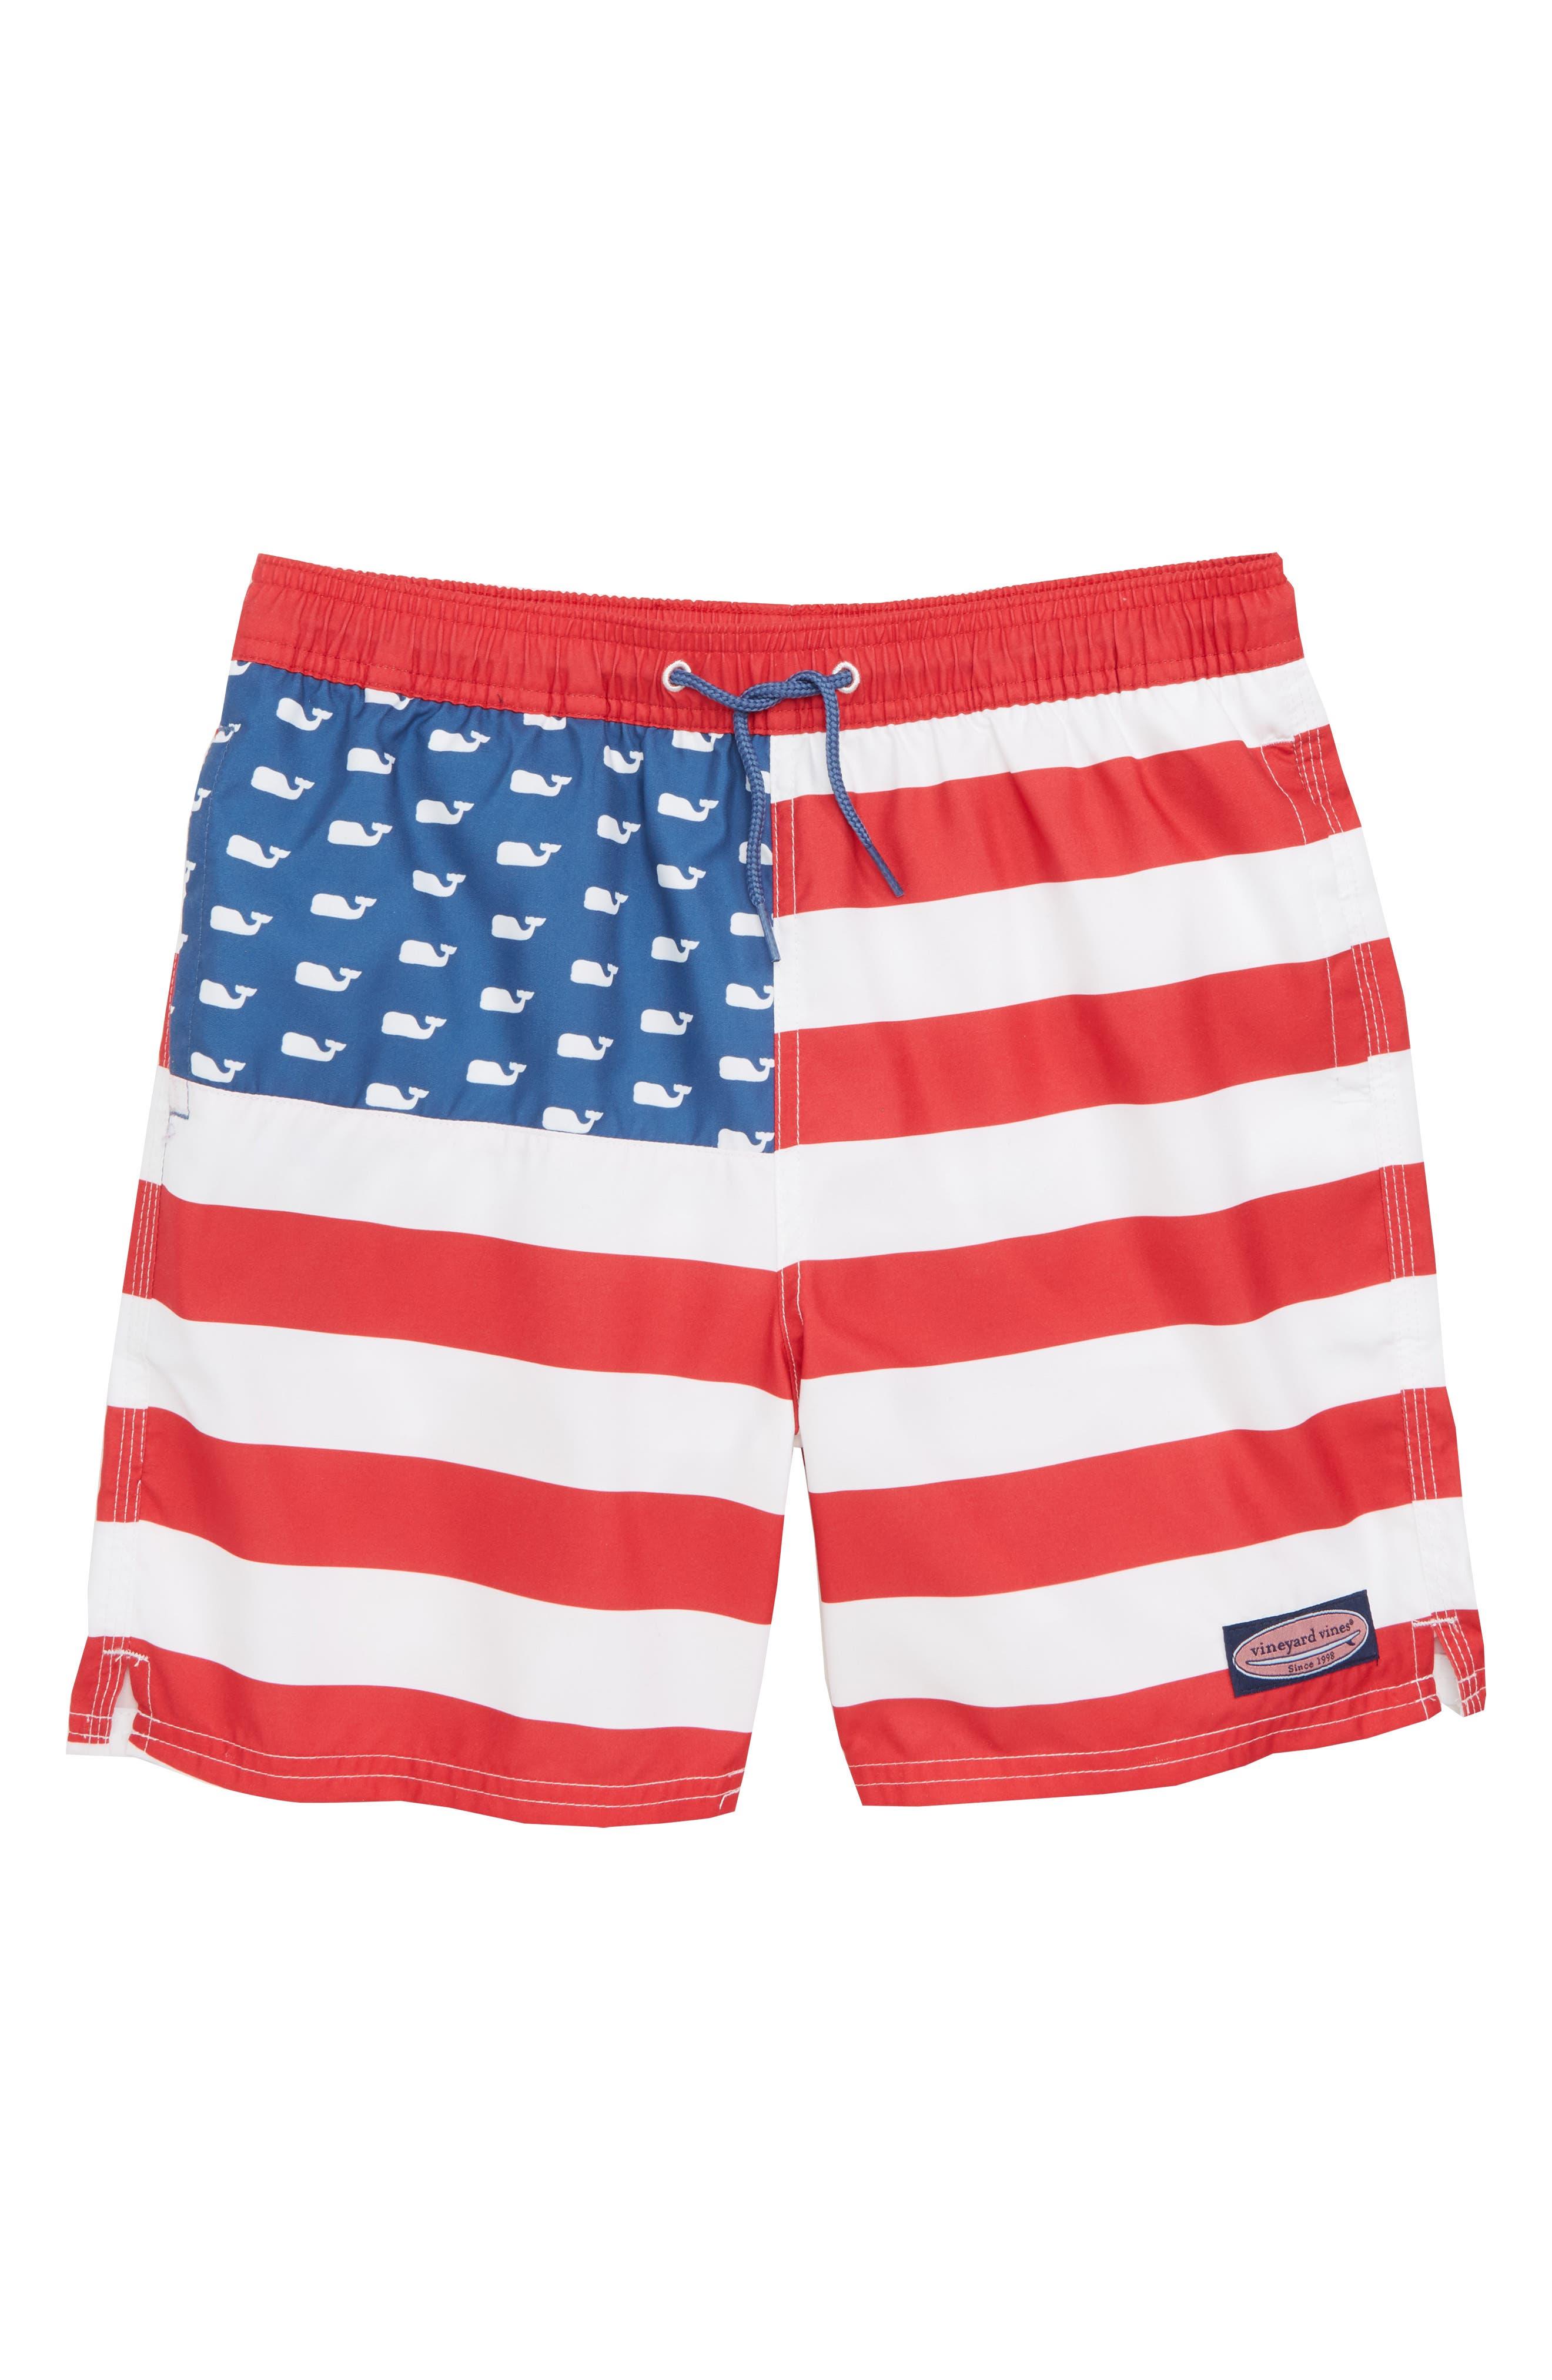 VINEYARD VINES,                             Chappy USA Flag Swim Trunks,                             Main thumbnail 1, color,                             461